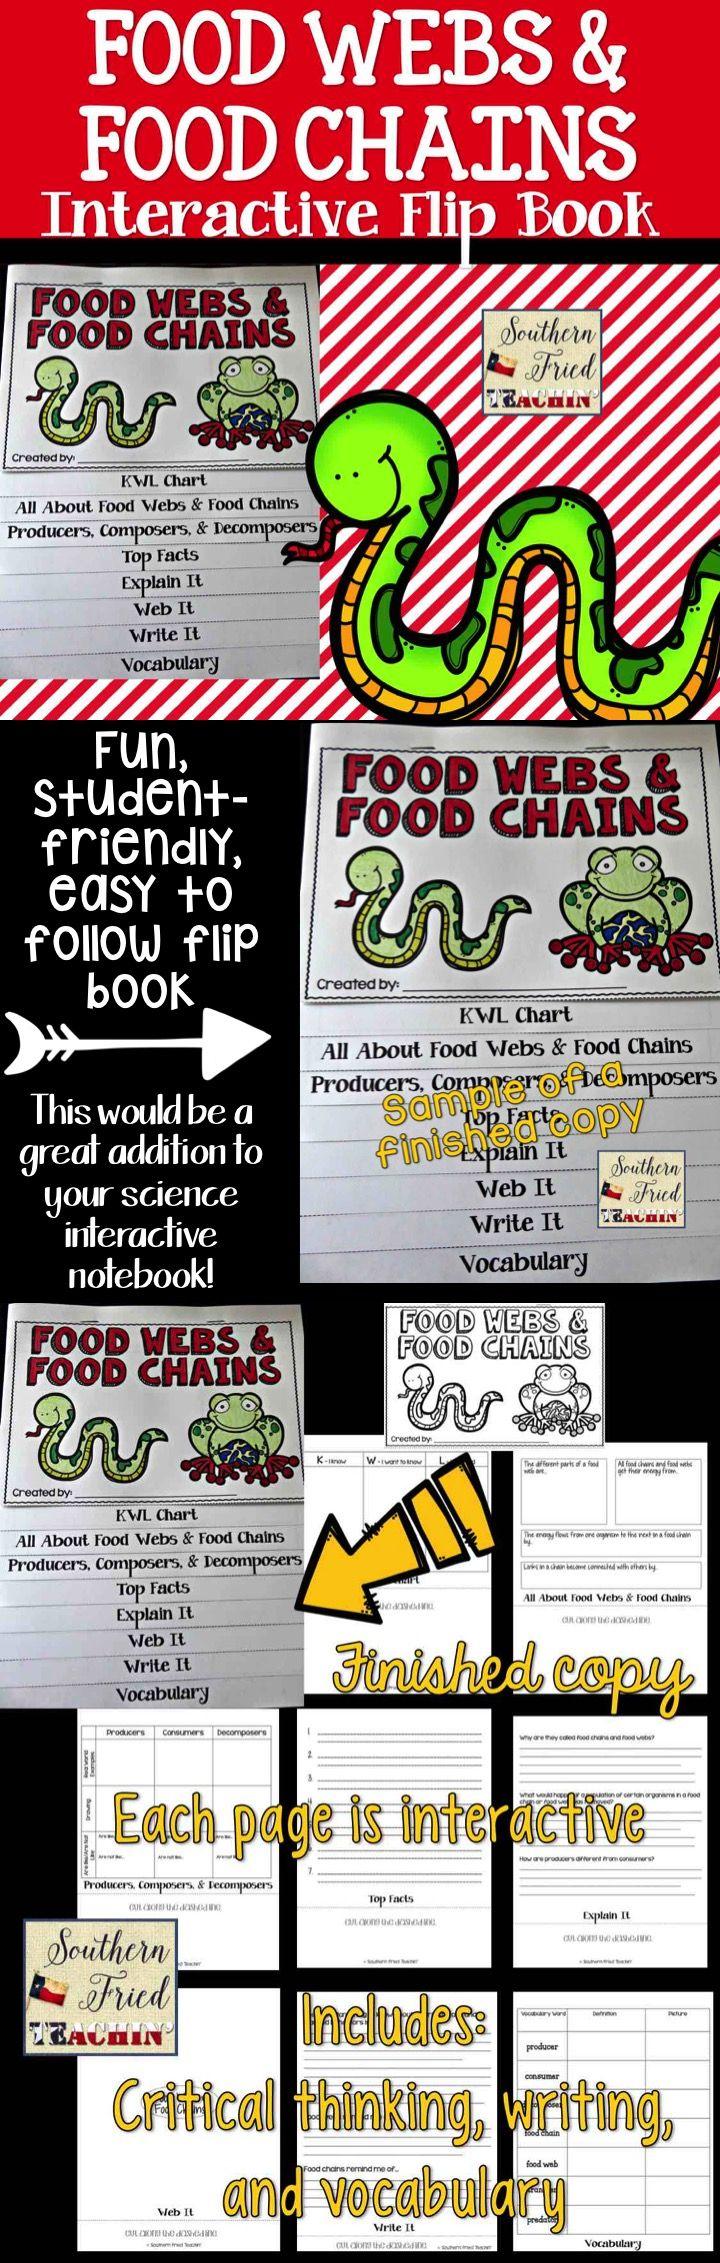 Food Webs & Food Chains Flip book, Interactive book